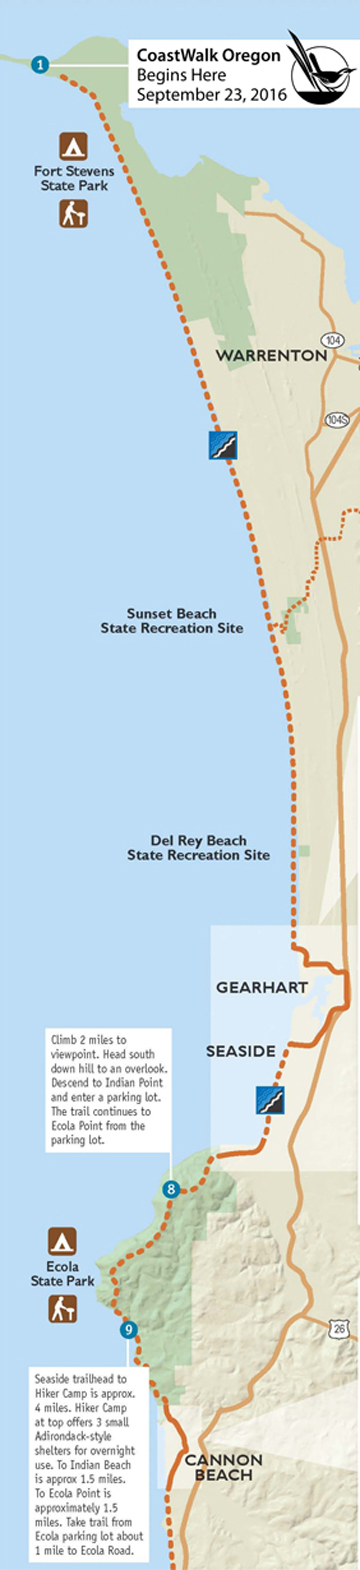 Rev. 360 pixel CoastWalk Oregon map for web